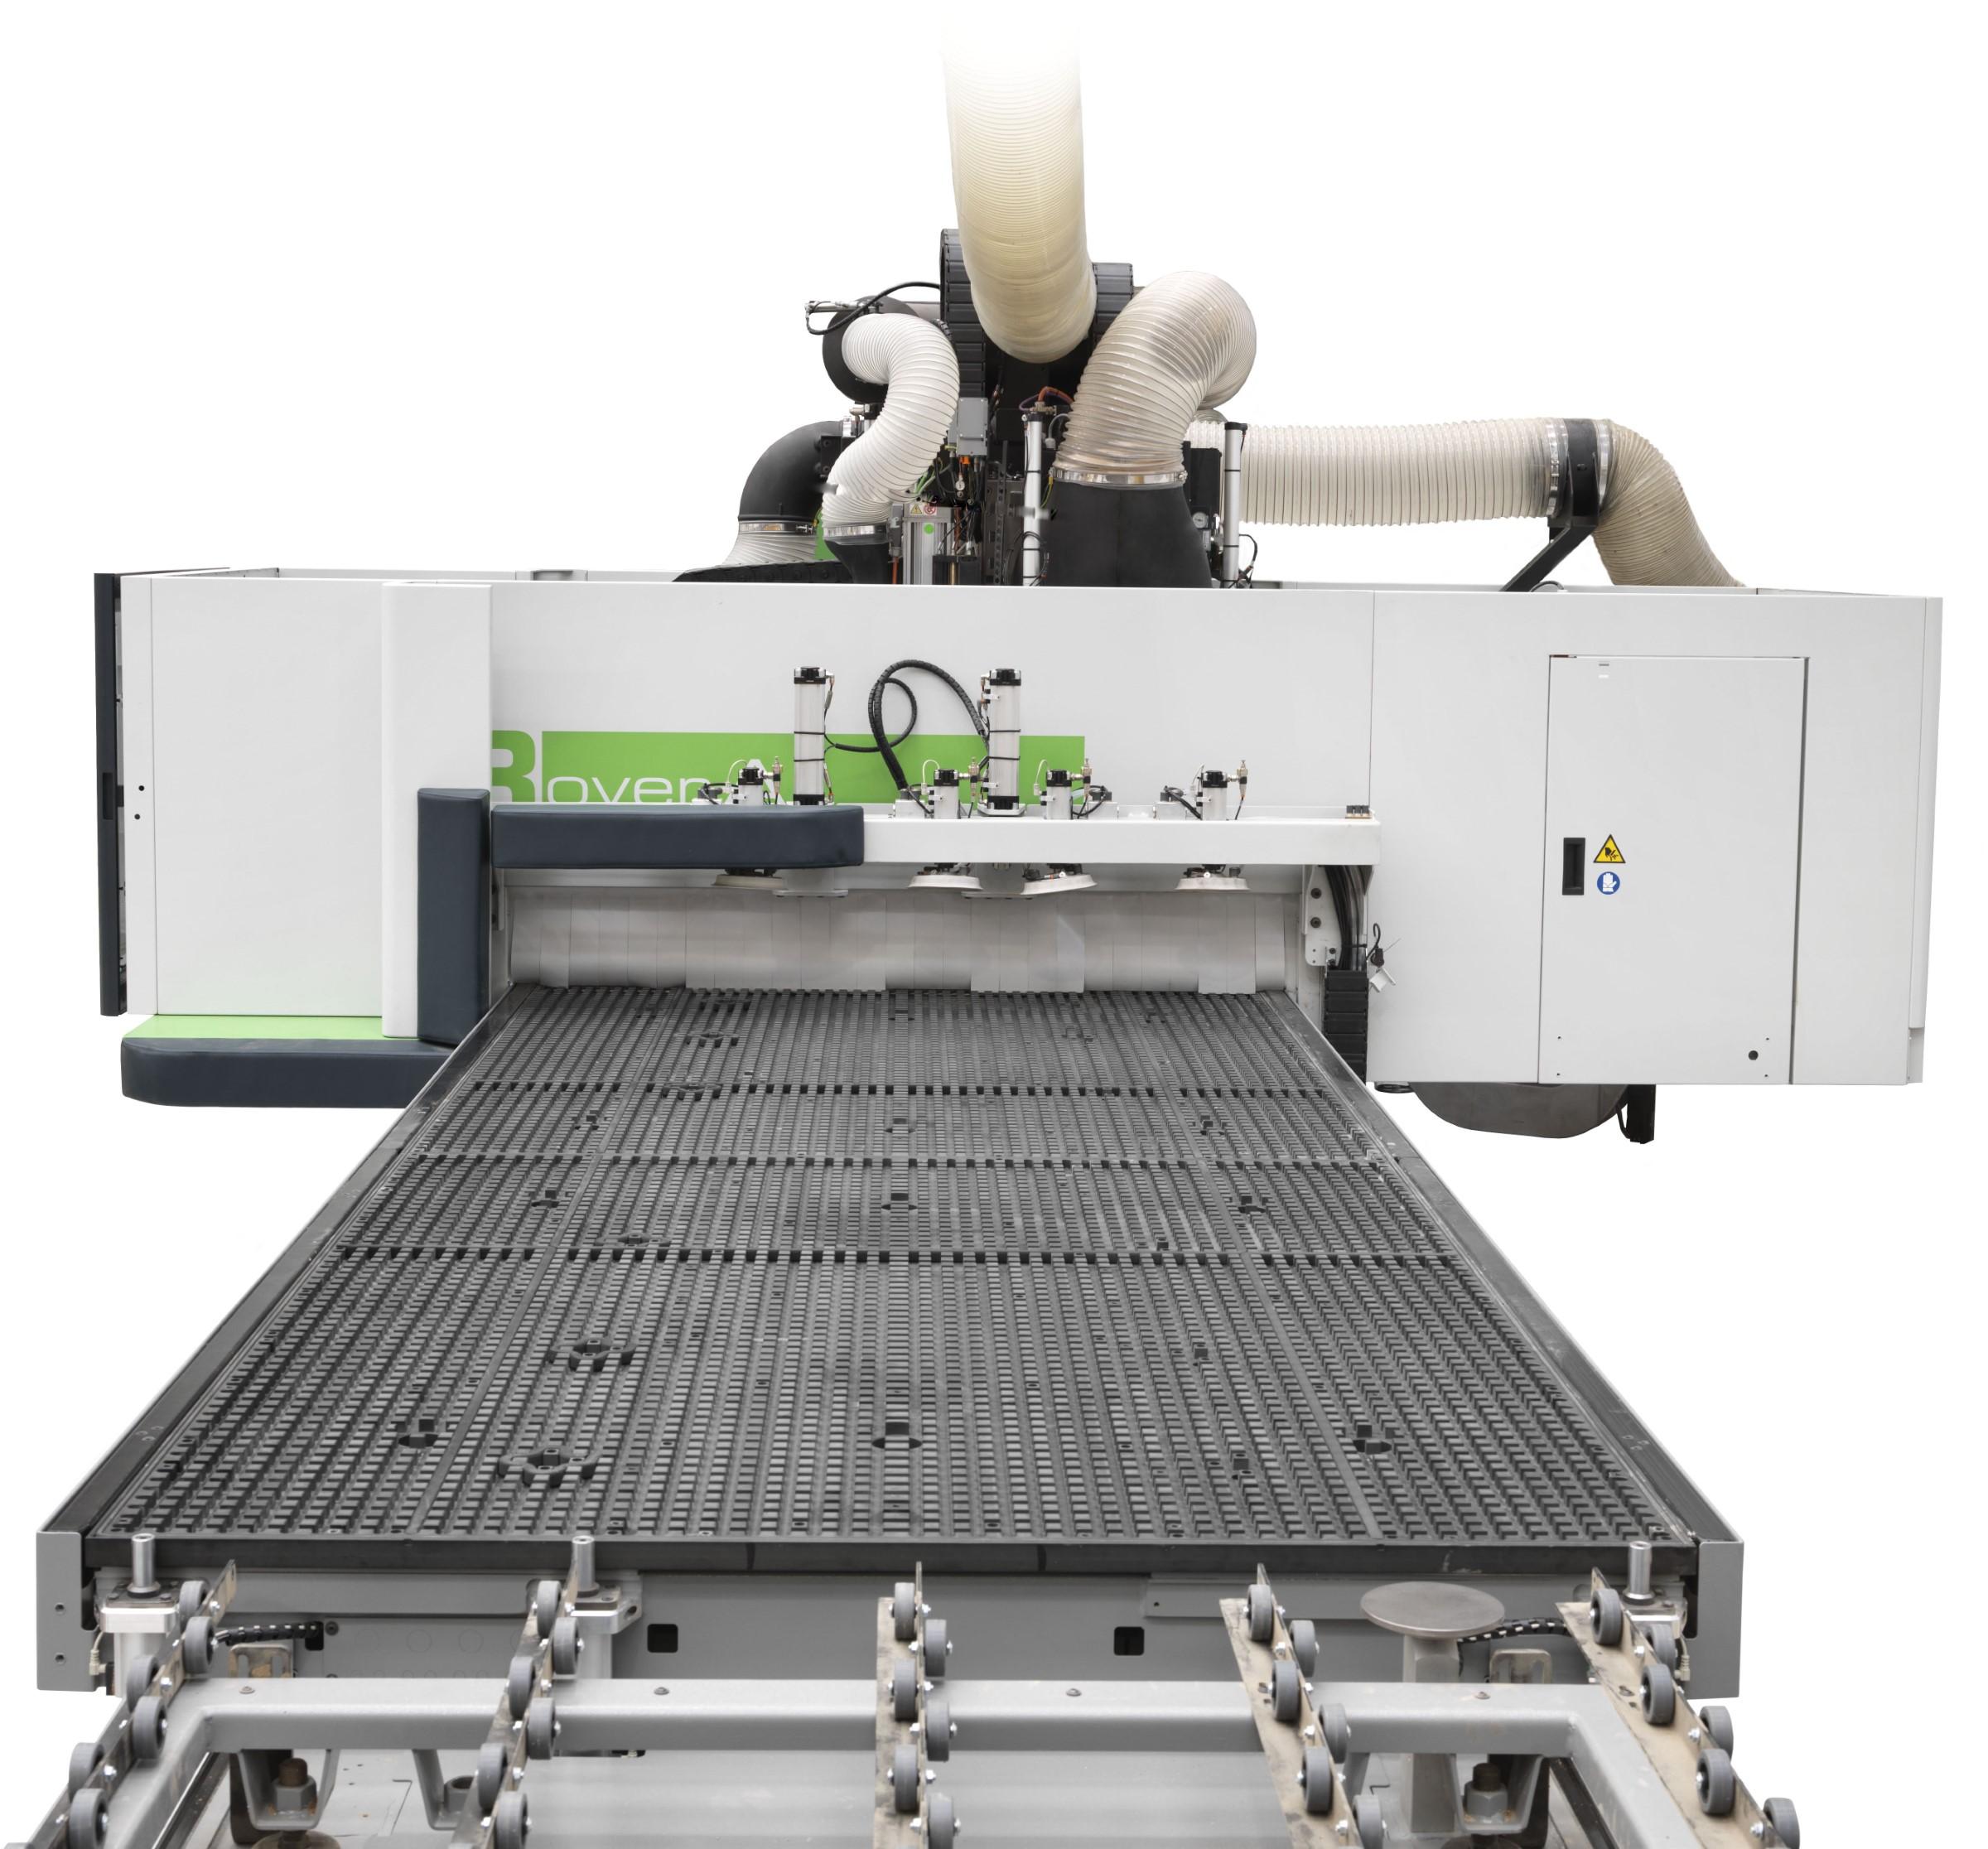 Biesse Rover A FT CNC nesting machine